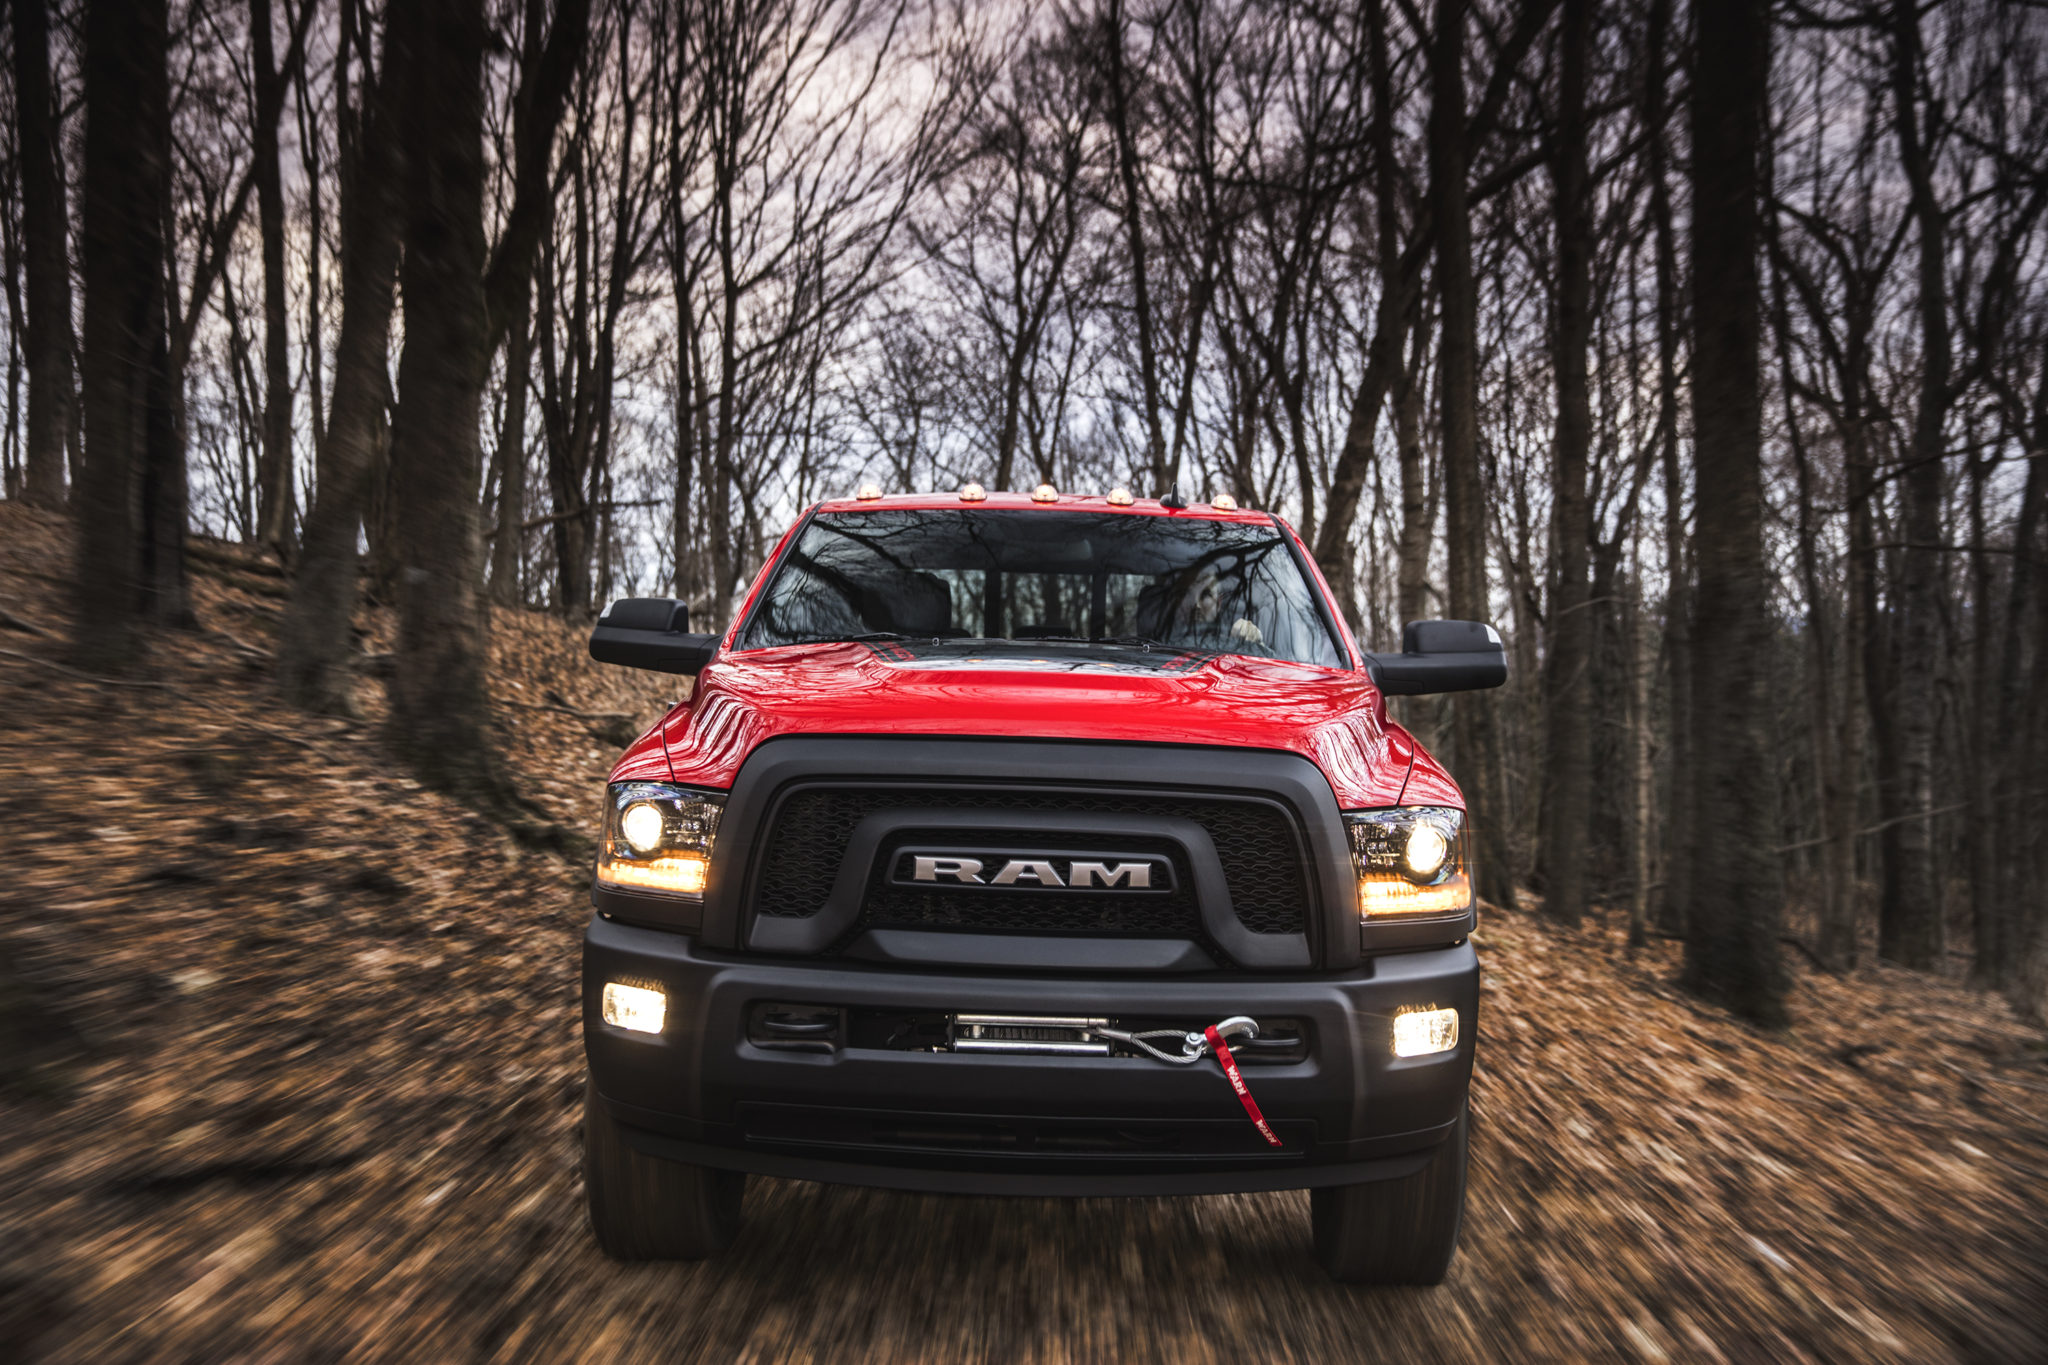 2017 Ram Power Wagon Crew Cab 4x4